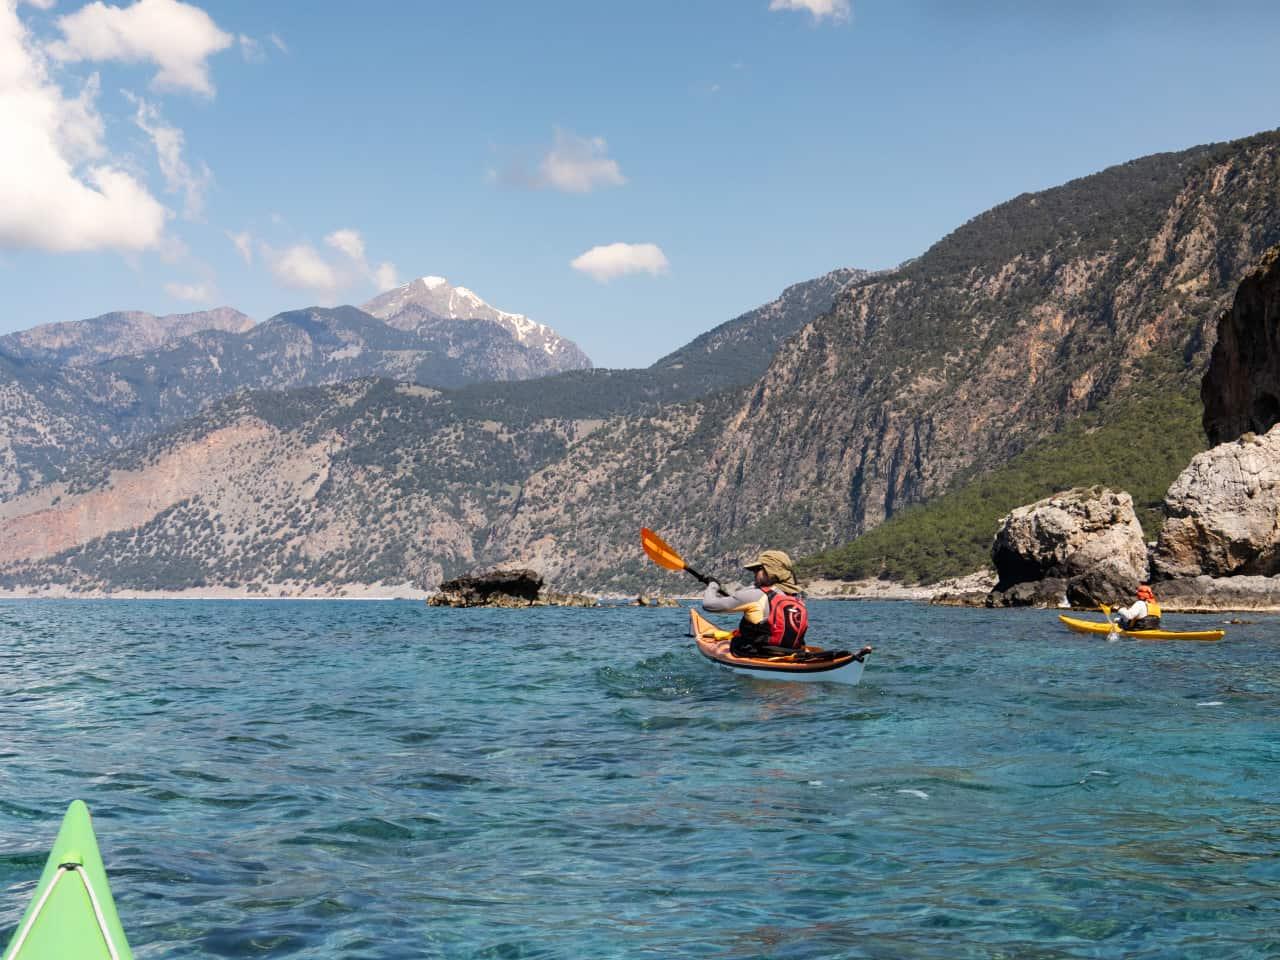 samaria national park sea kayak trip, best sea kayak trip south chania, two day sea kayak trip loutro, sea kayak trip  agia roumeli, sea kayak trip agios pavlos beach